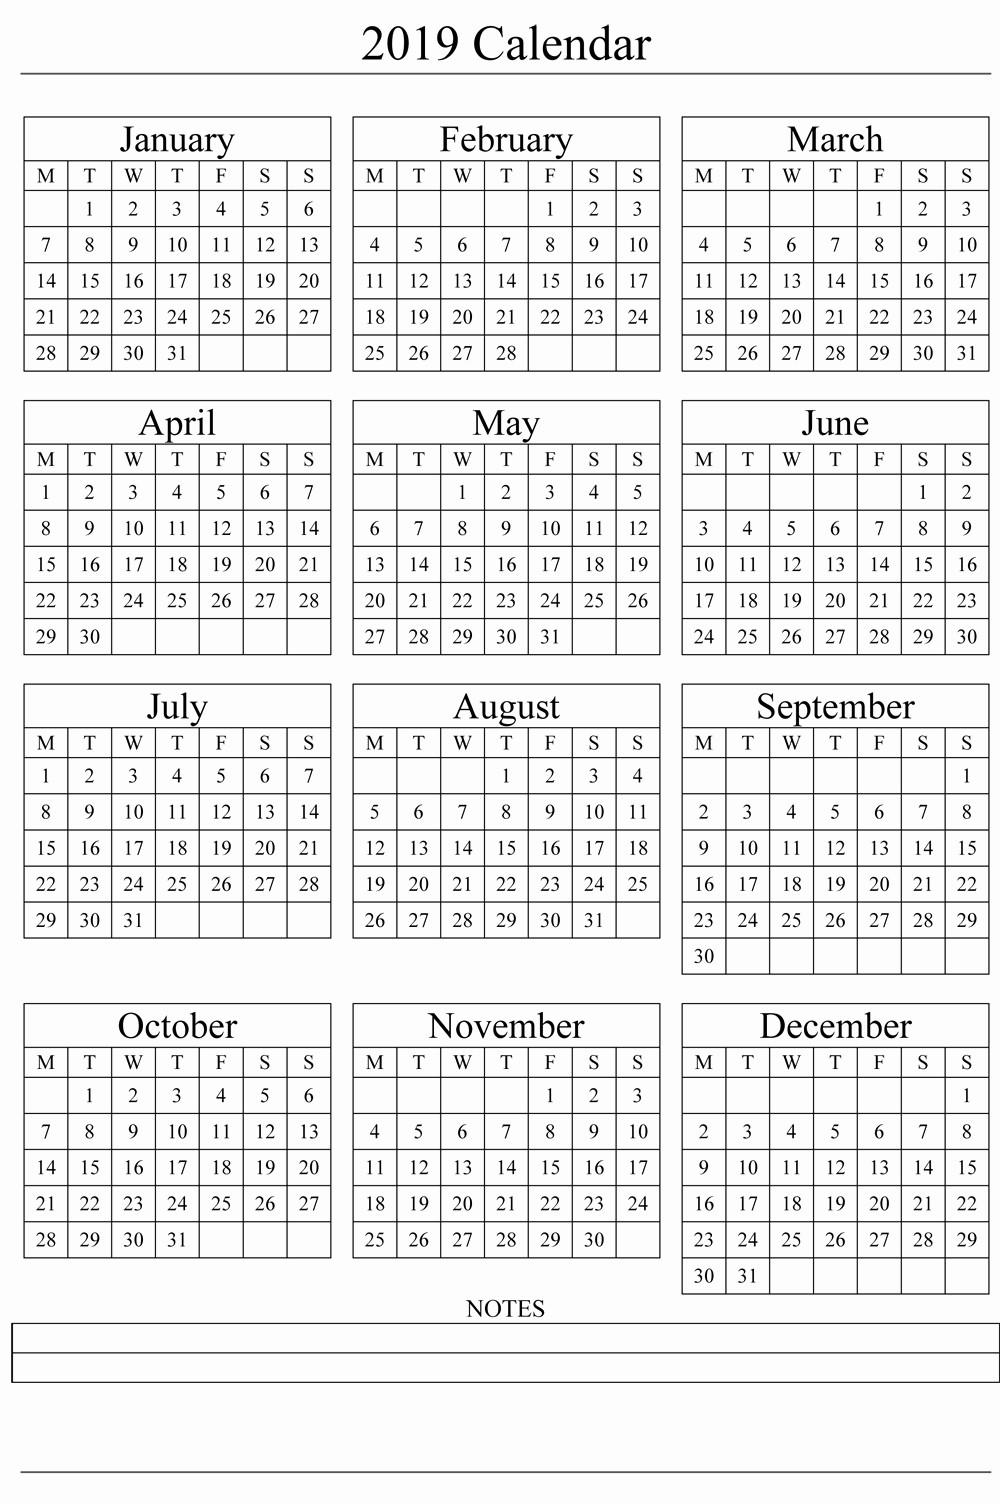 2019 Word Calendar with Holidays Elegant Free Yearly Calendar Printable 2019 Pdf Excel Word